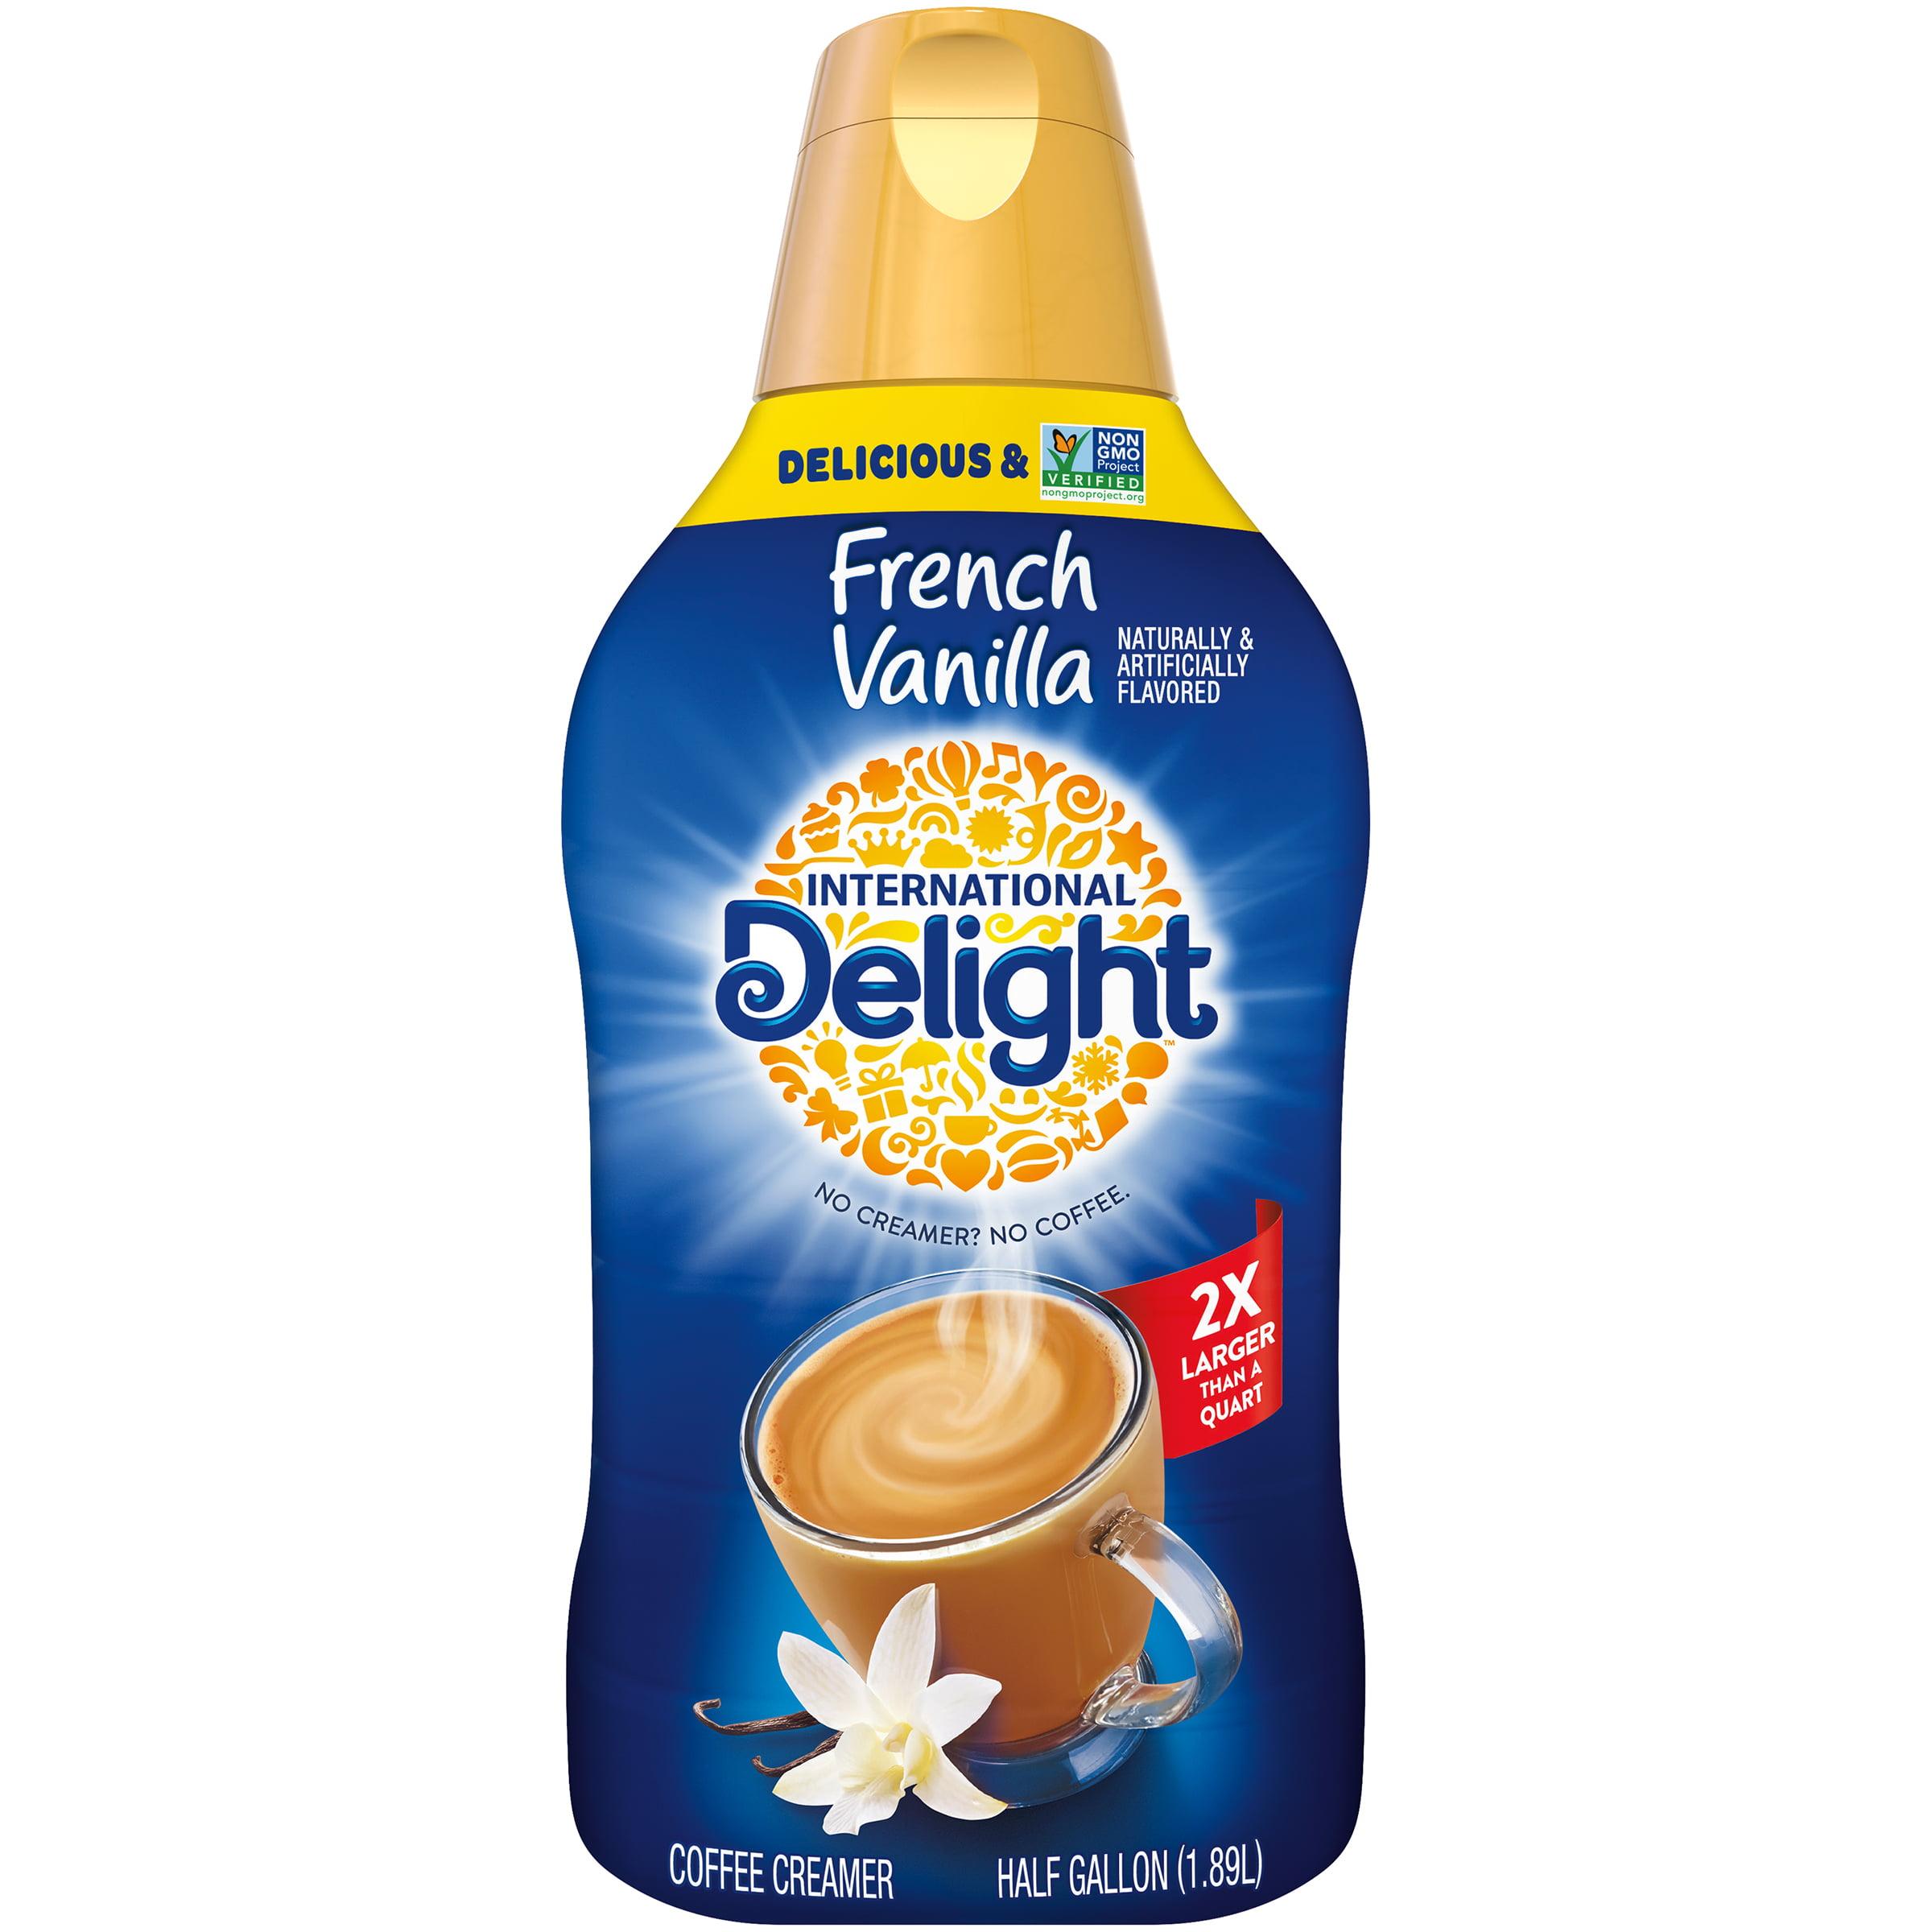 International Delight French Vanilla Coffee Creamer, Half Gallon    Walmart.com